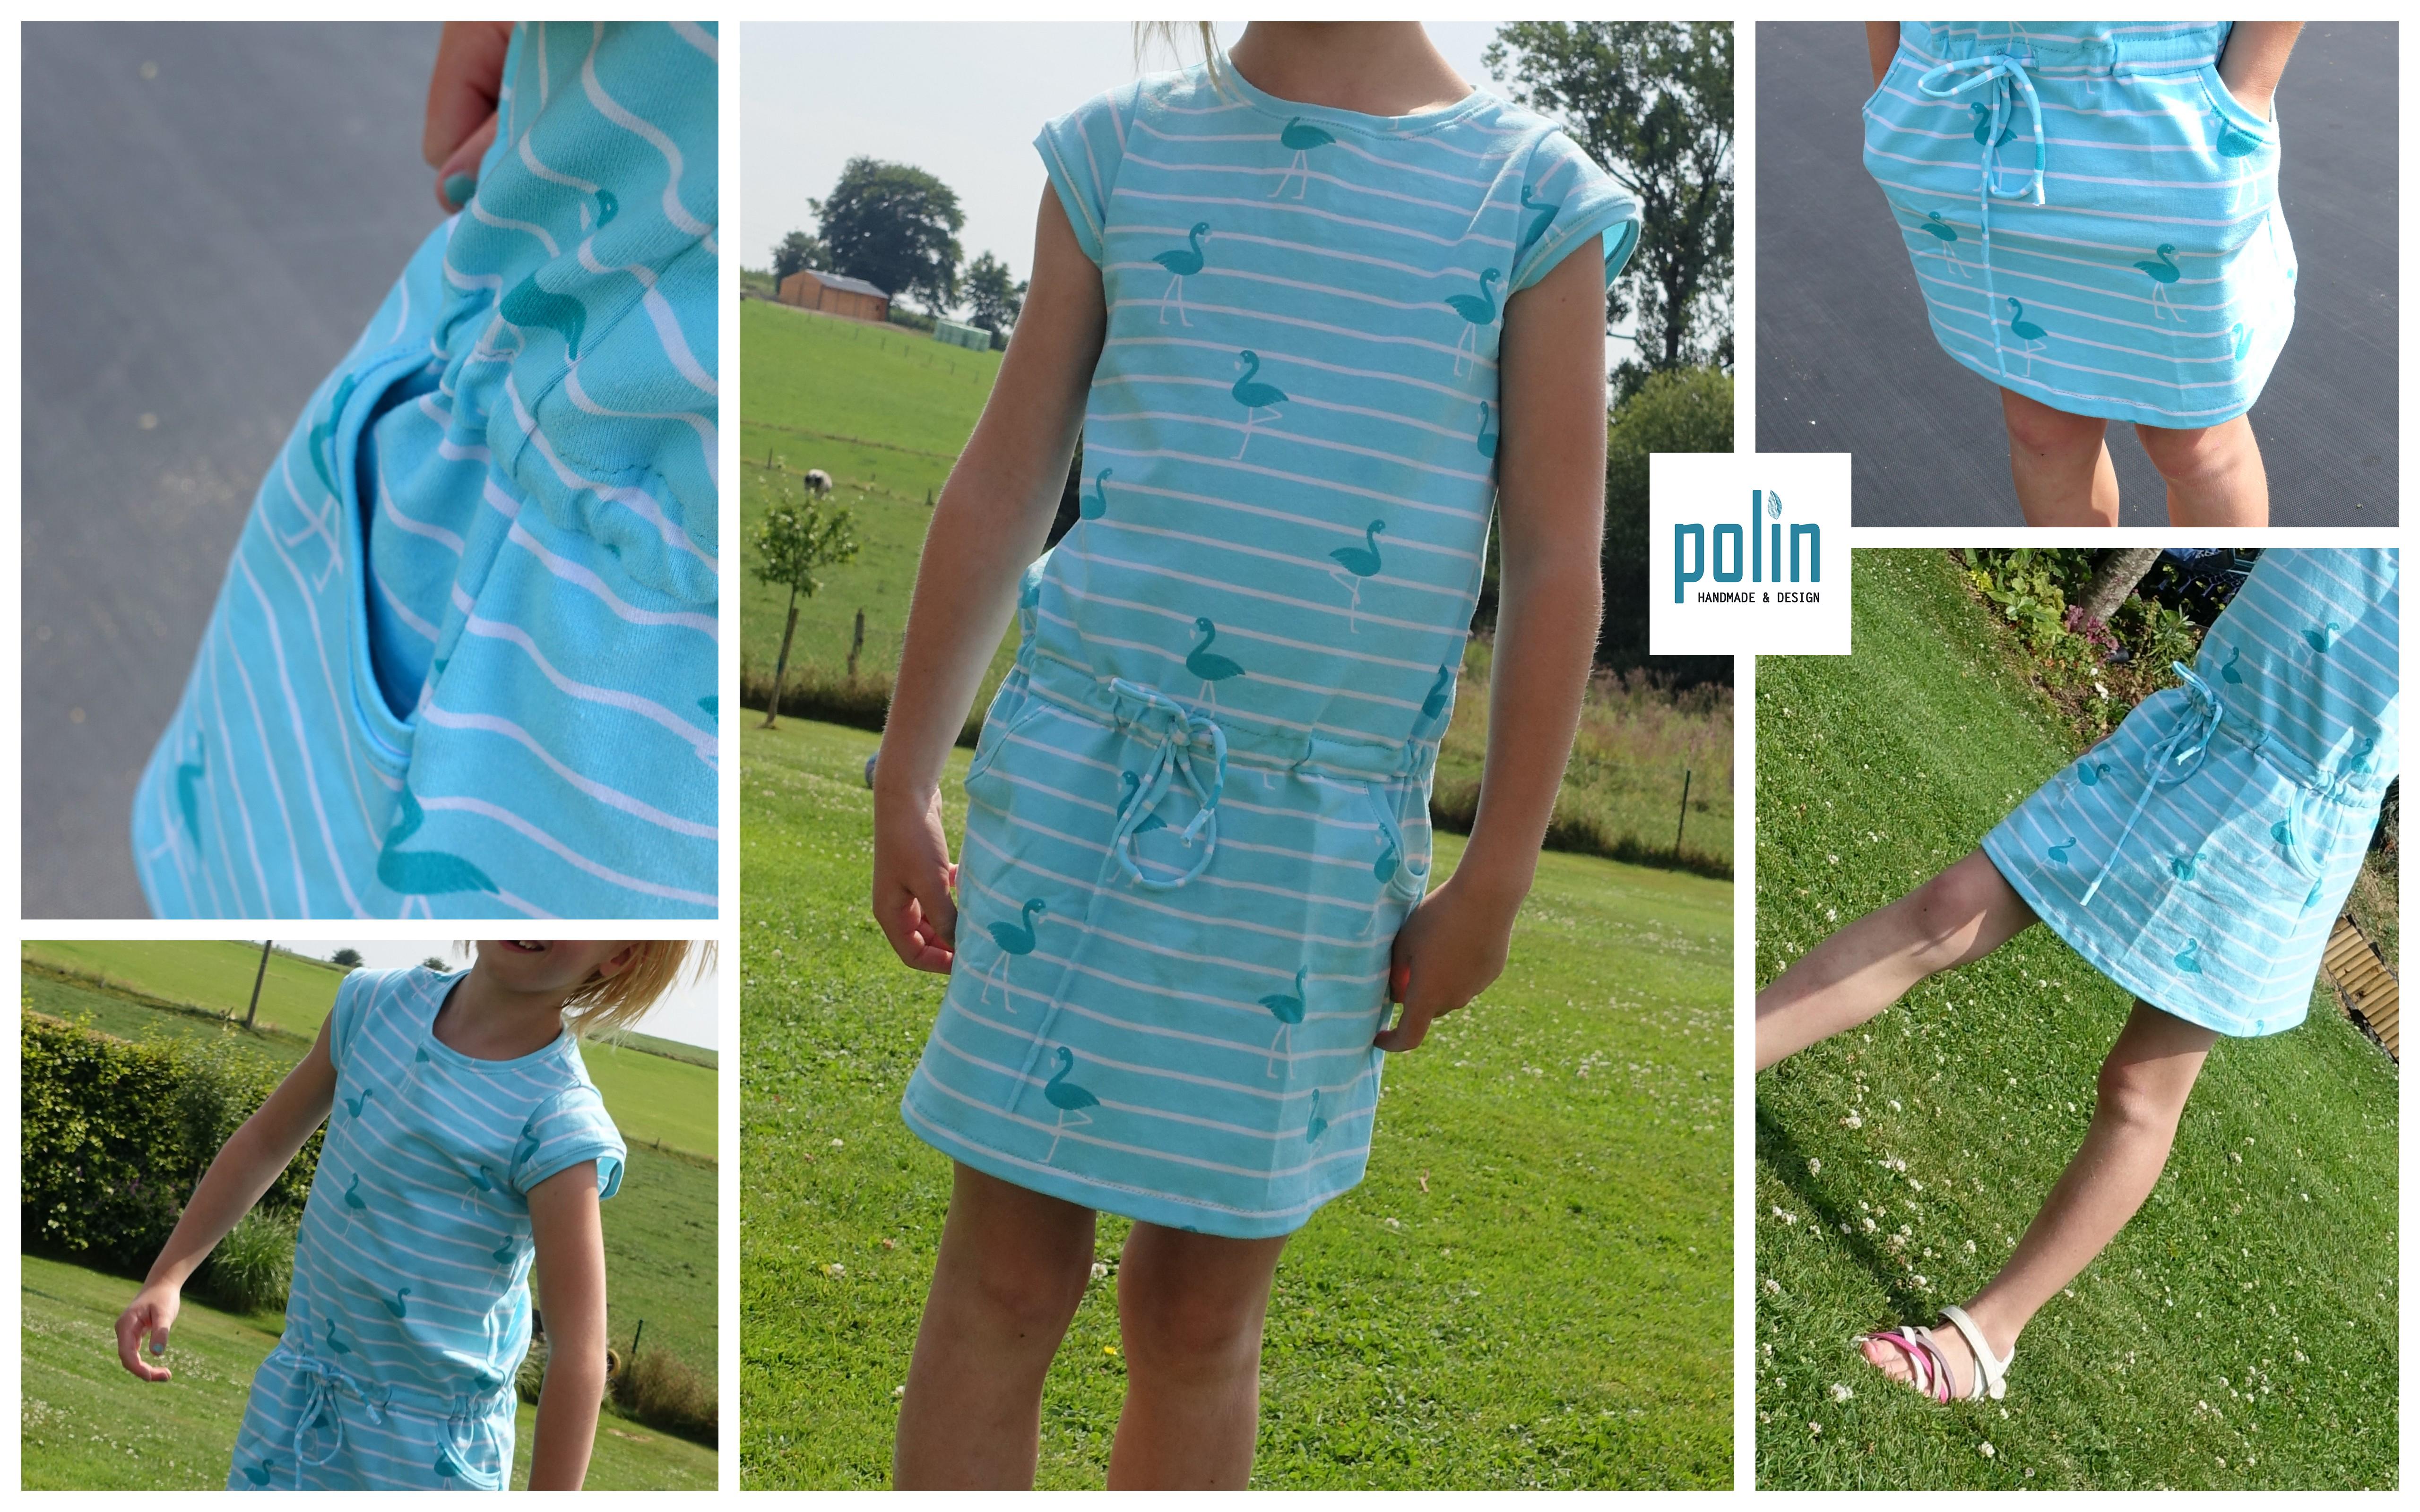 Robe Flamants Turquoises Polin Handmade And Design